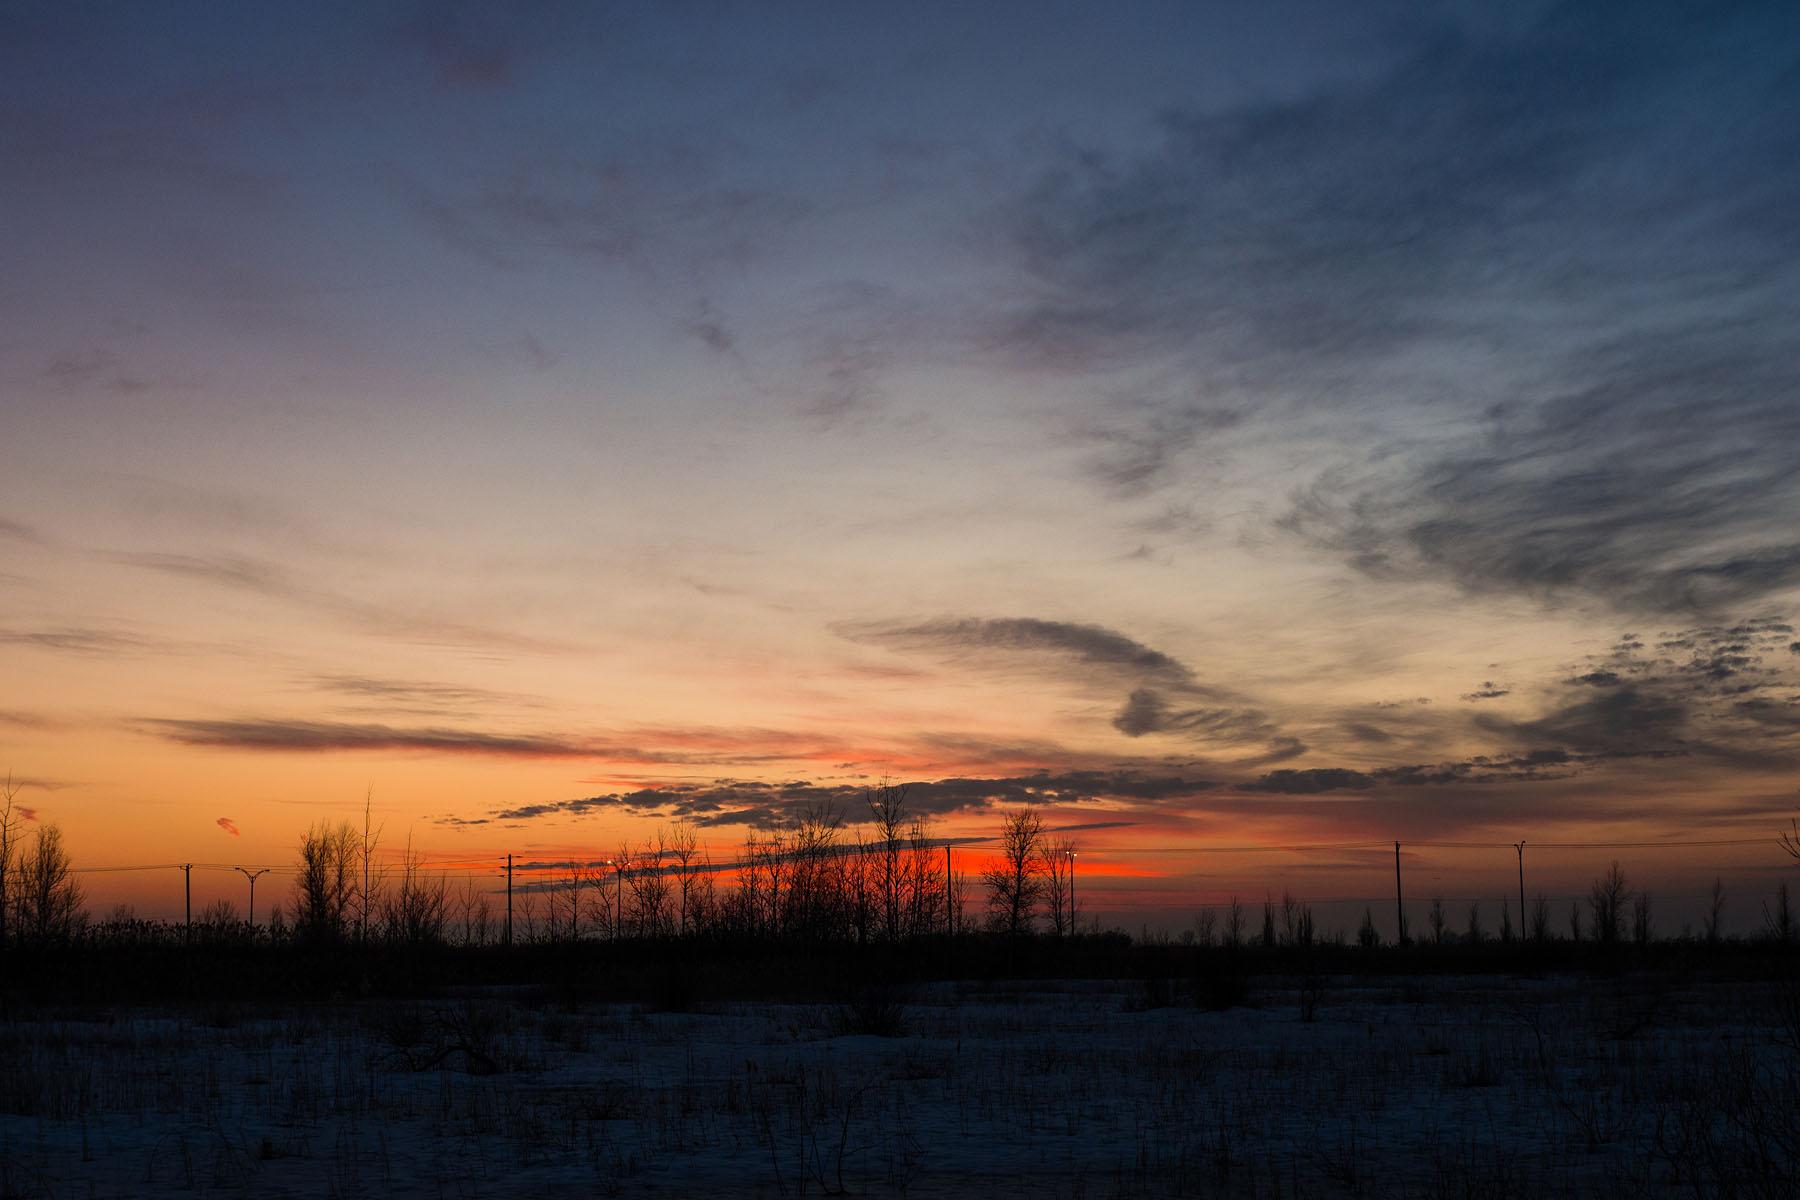 sunset-7.jpg